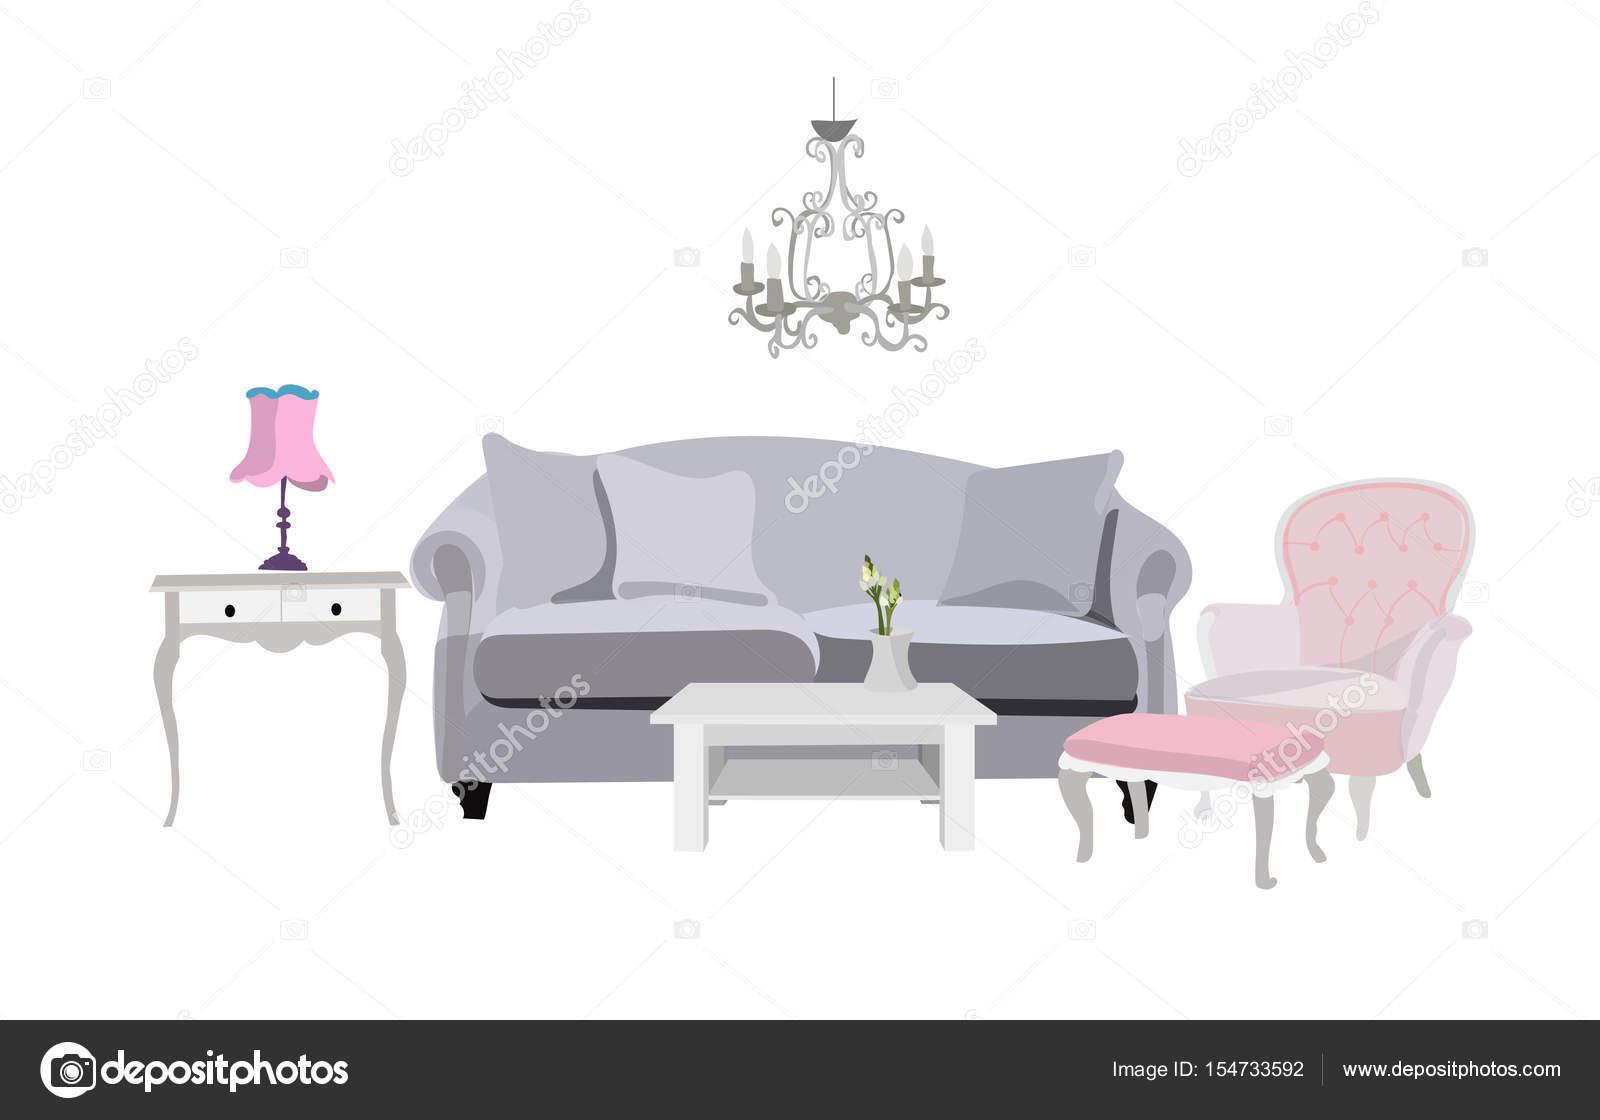 Wohnzimmer Möbel Vektorgrafik — Stockvektor © joanna.rosado@gmail ...